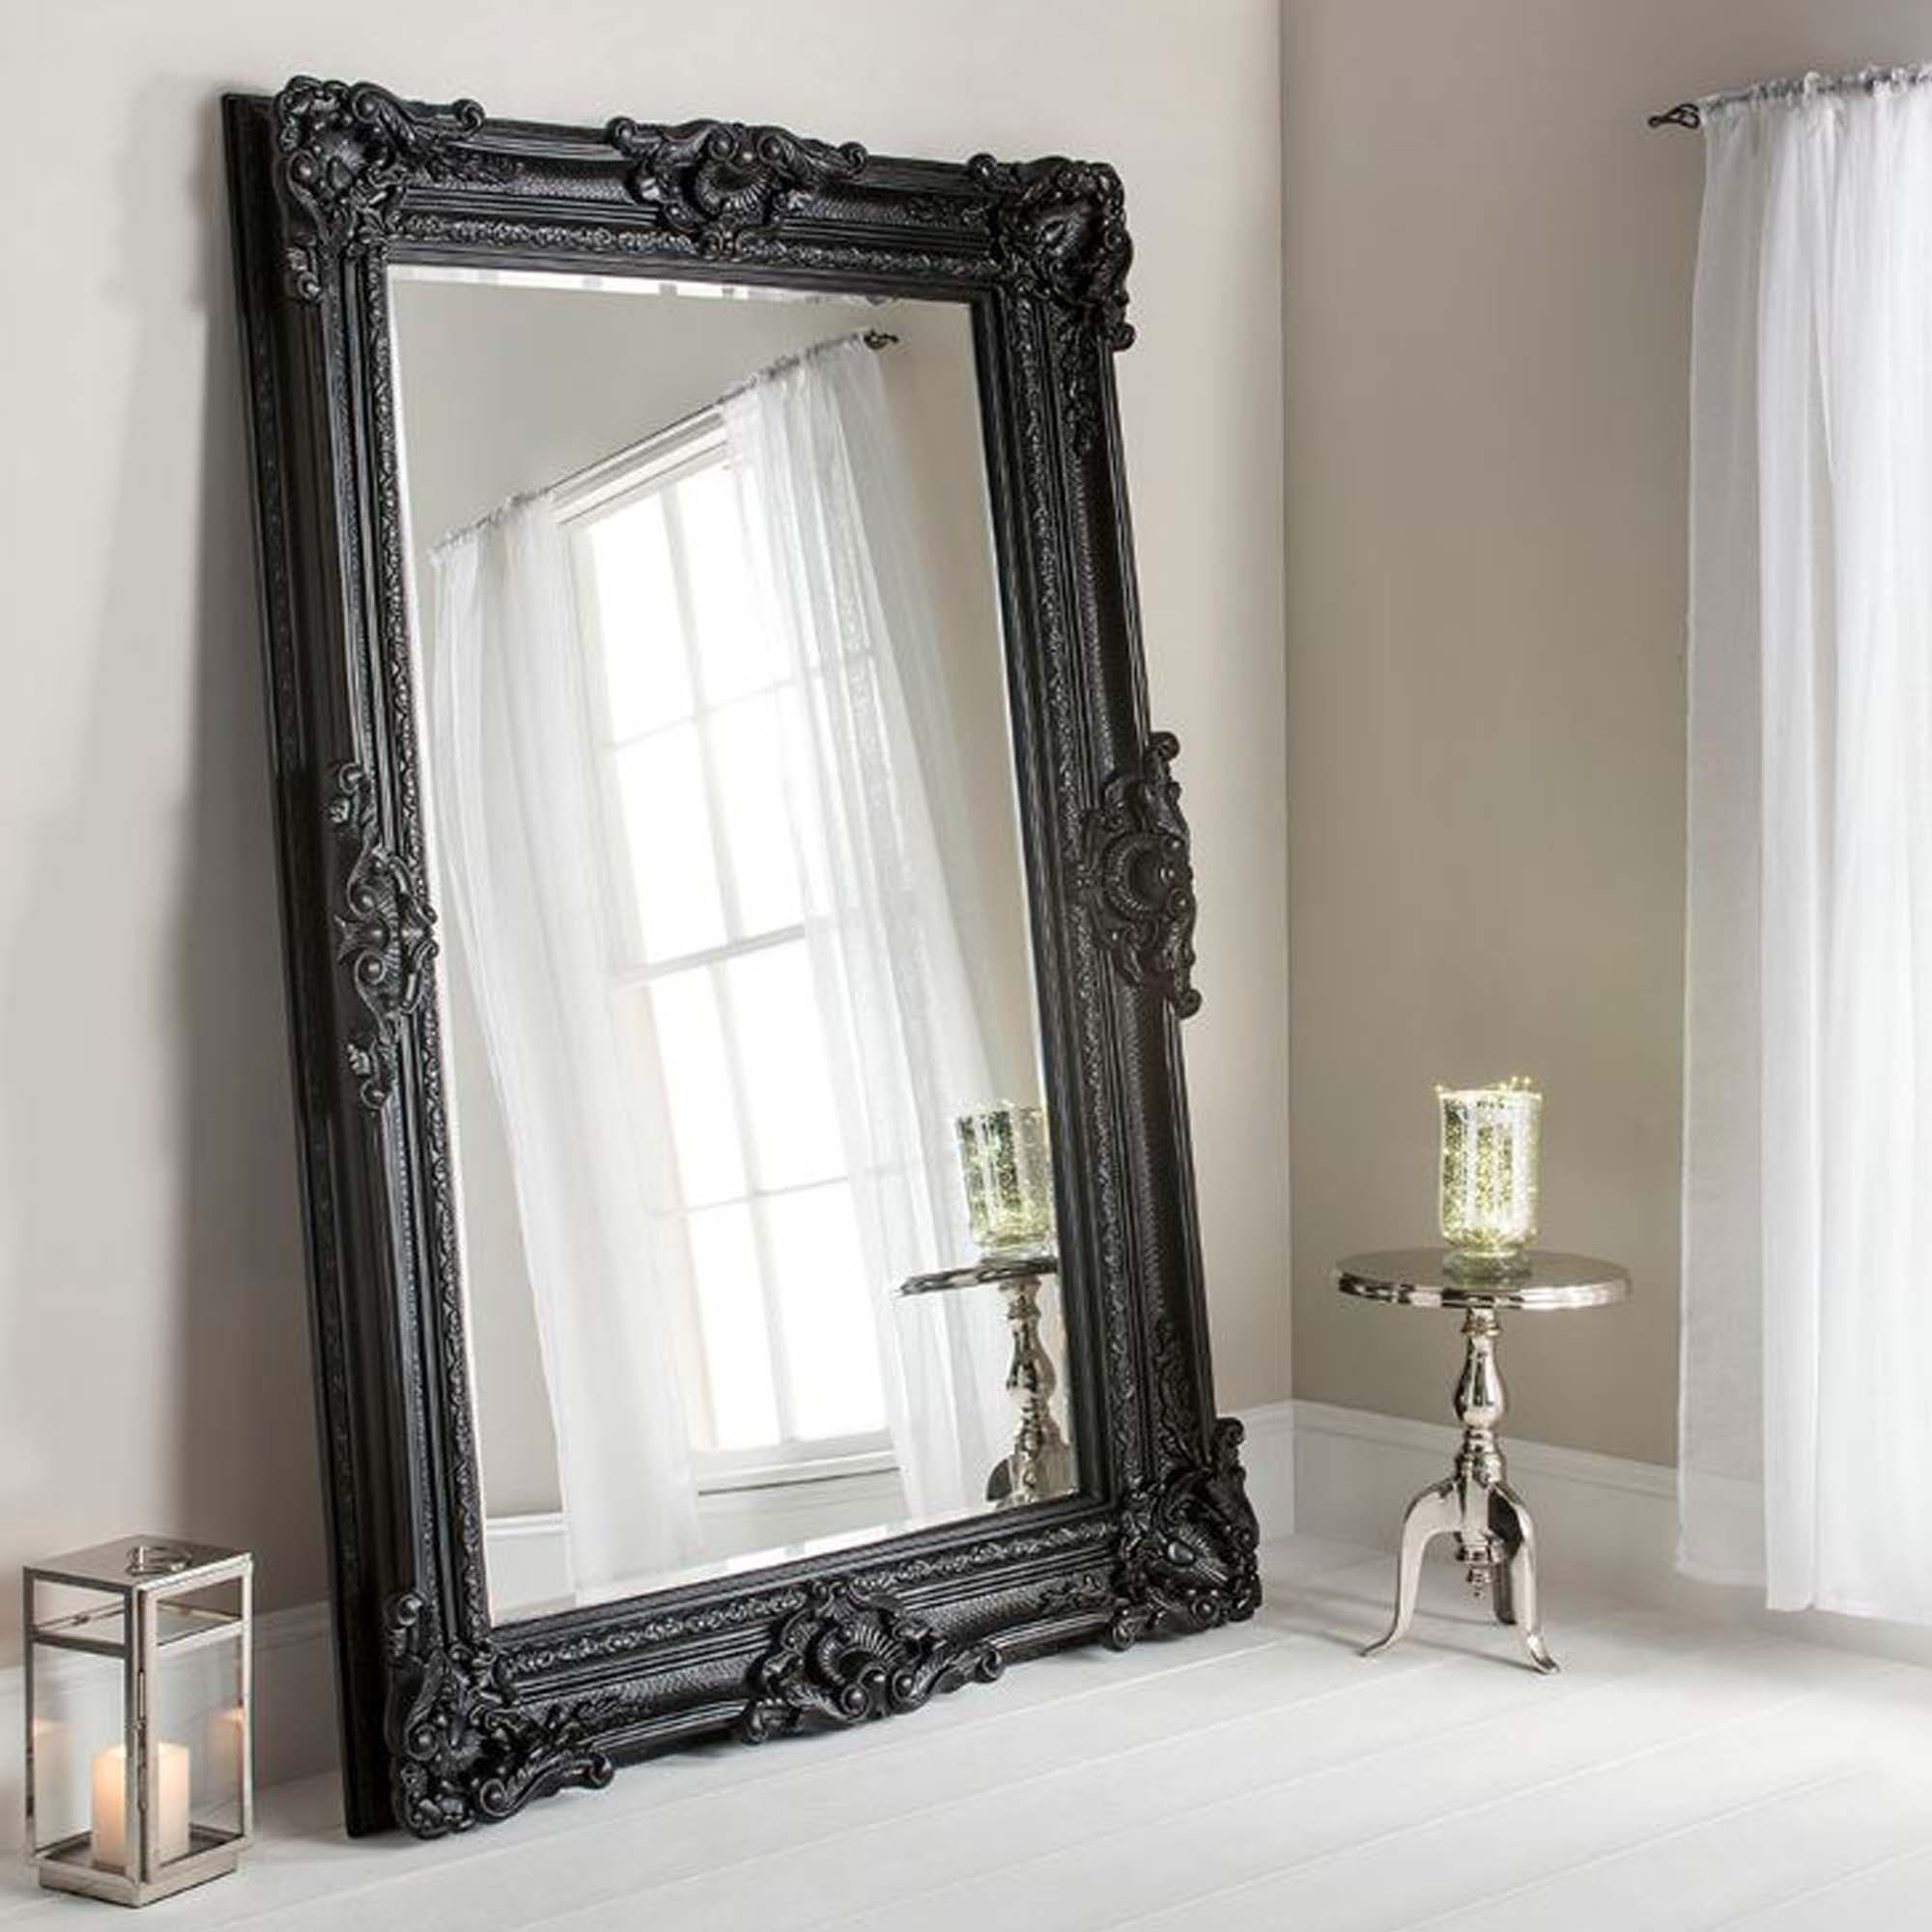 Buckingham Black Antique French Style Floorstanding Mirror